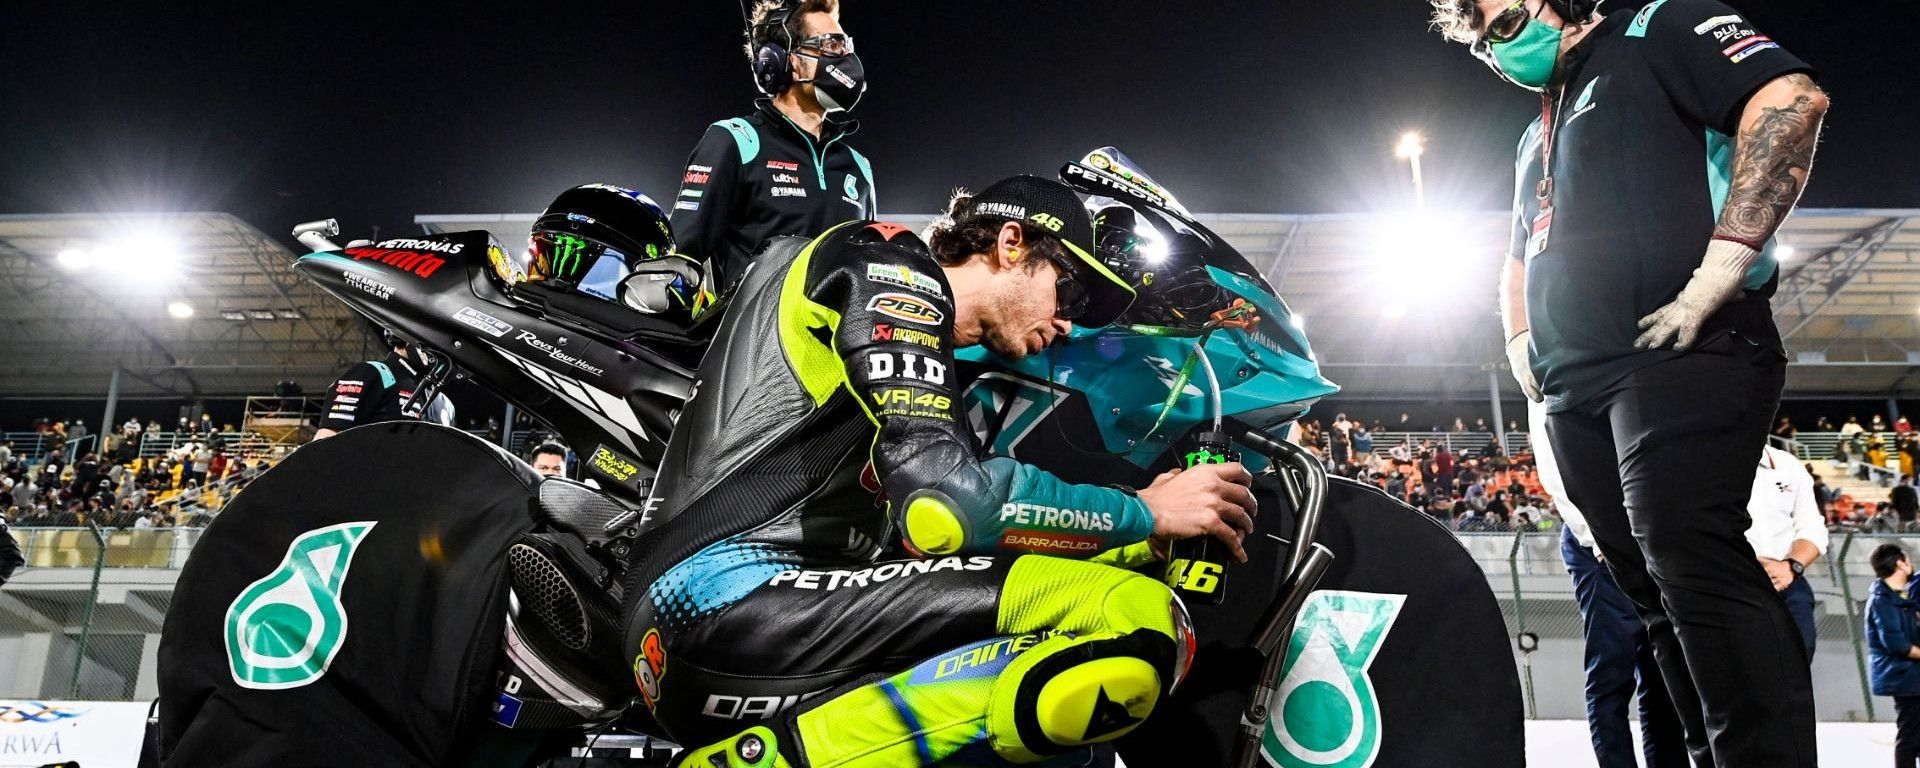 MotoGP, GP Qatar 2021: Valentino Rossi (Yamaha Petronas)